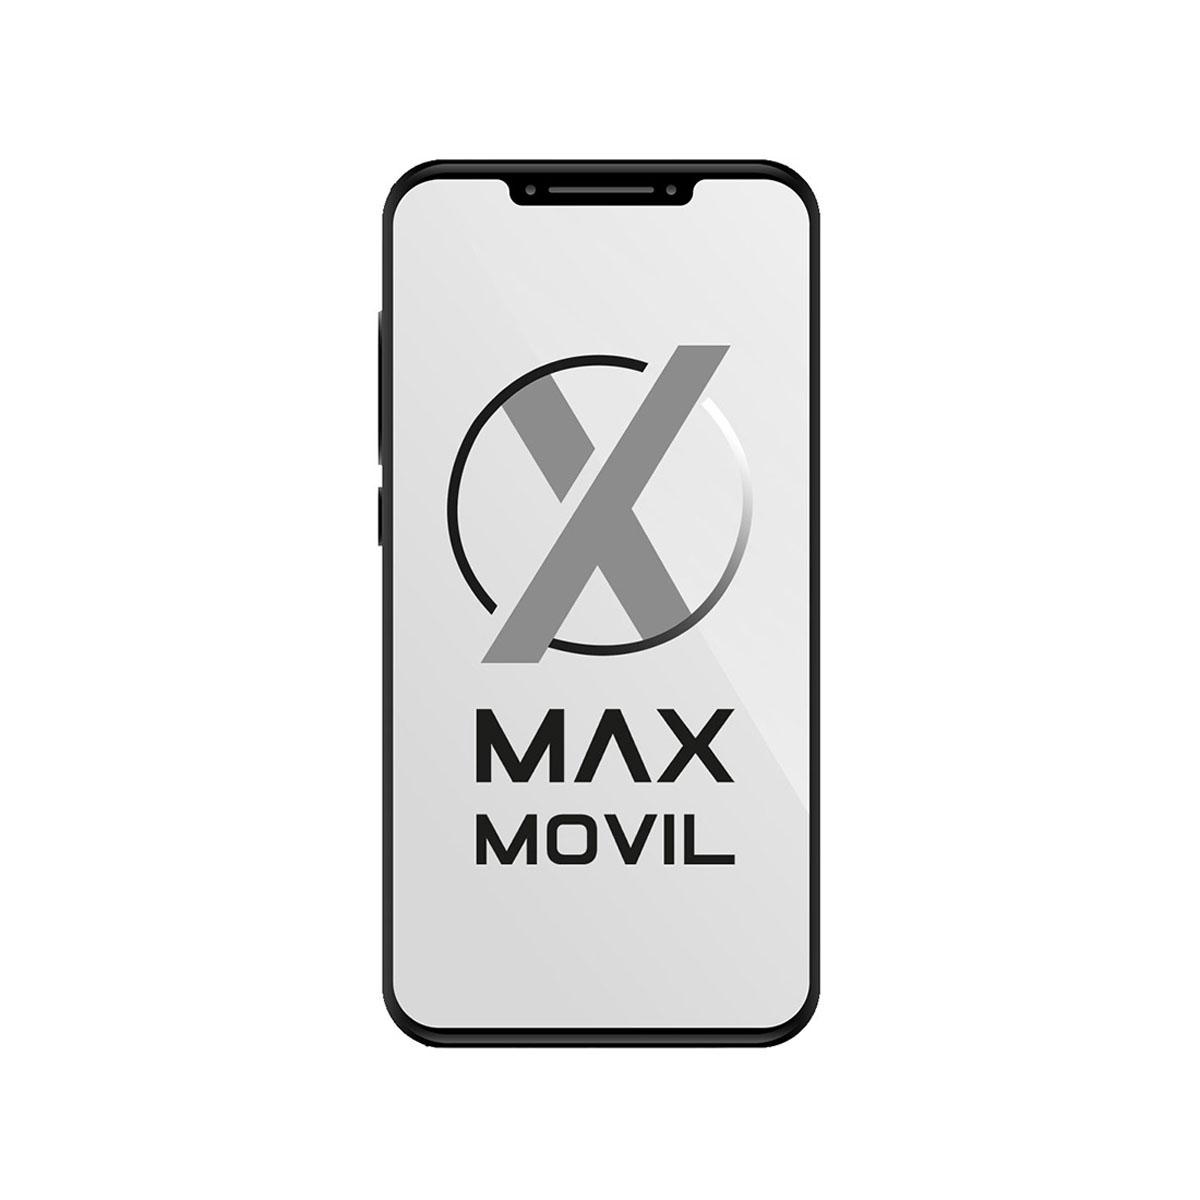 Protector de pantalla de cristal templado para iPhone XR/ 11